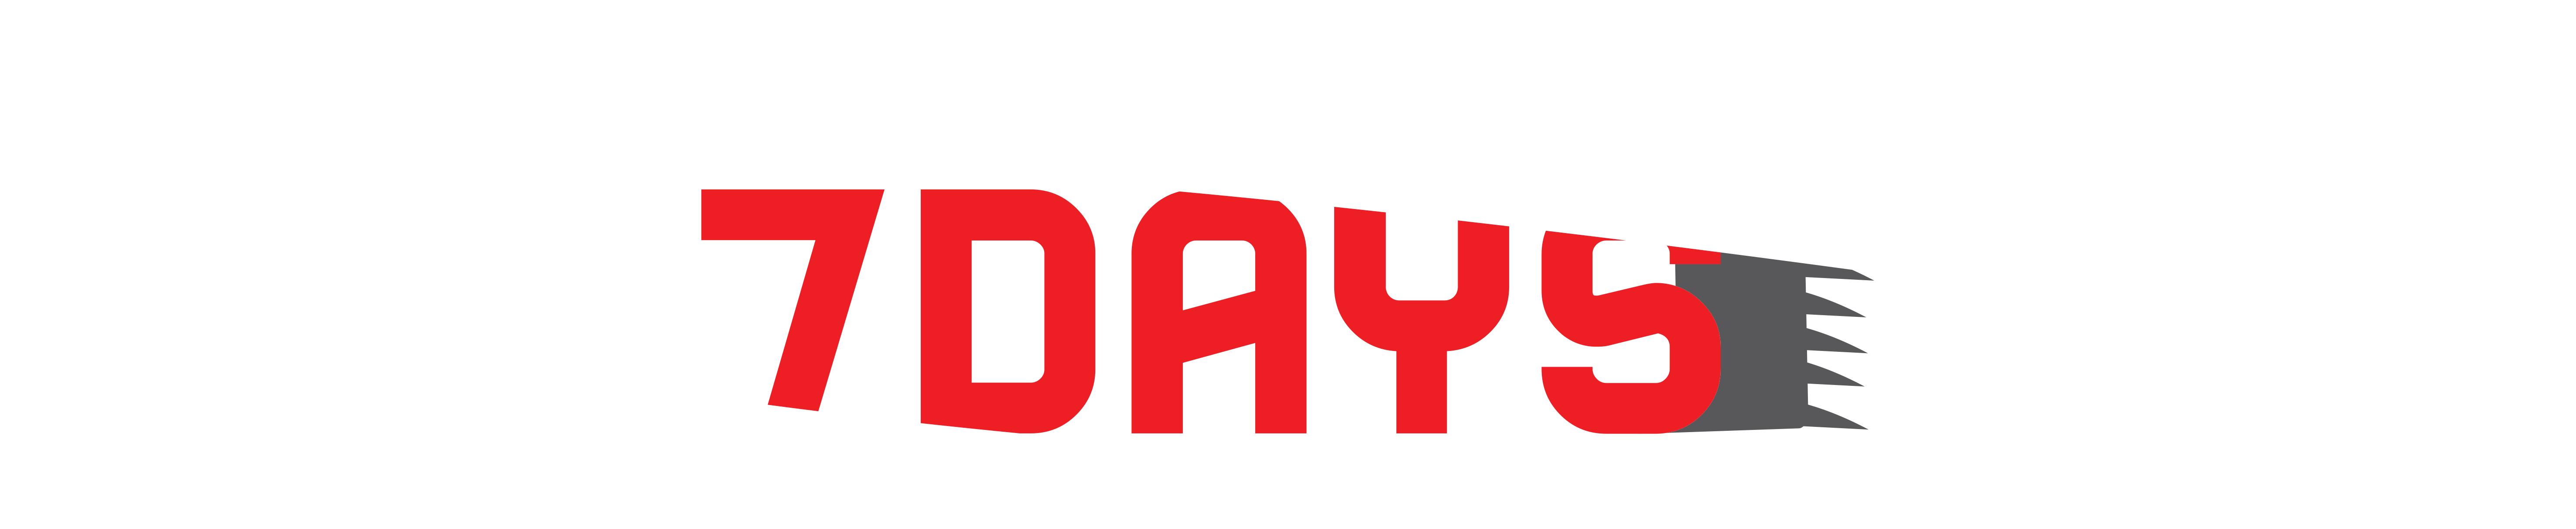 7days Barbershop Logo